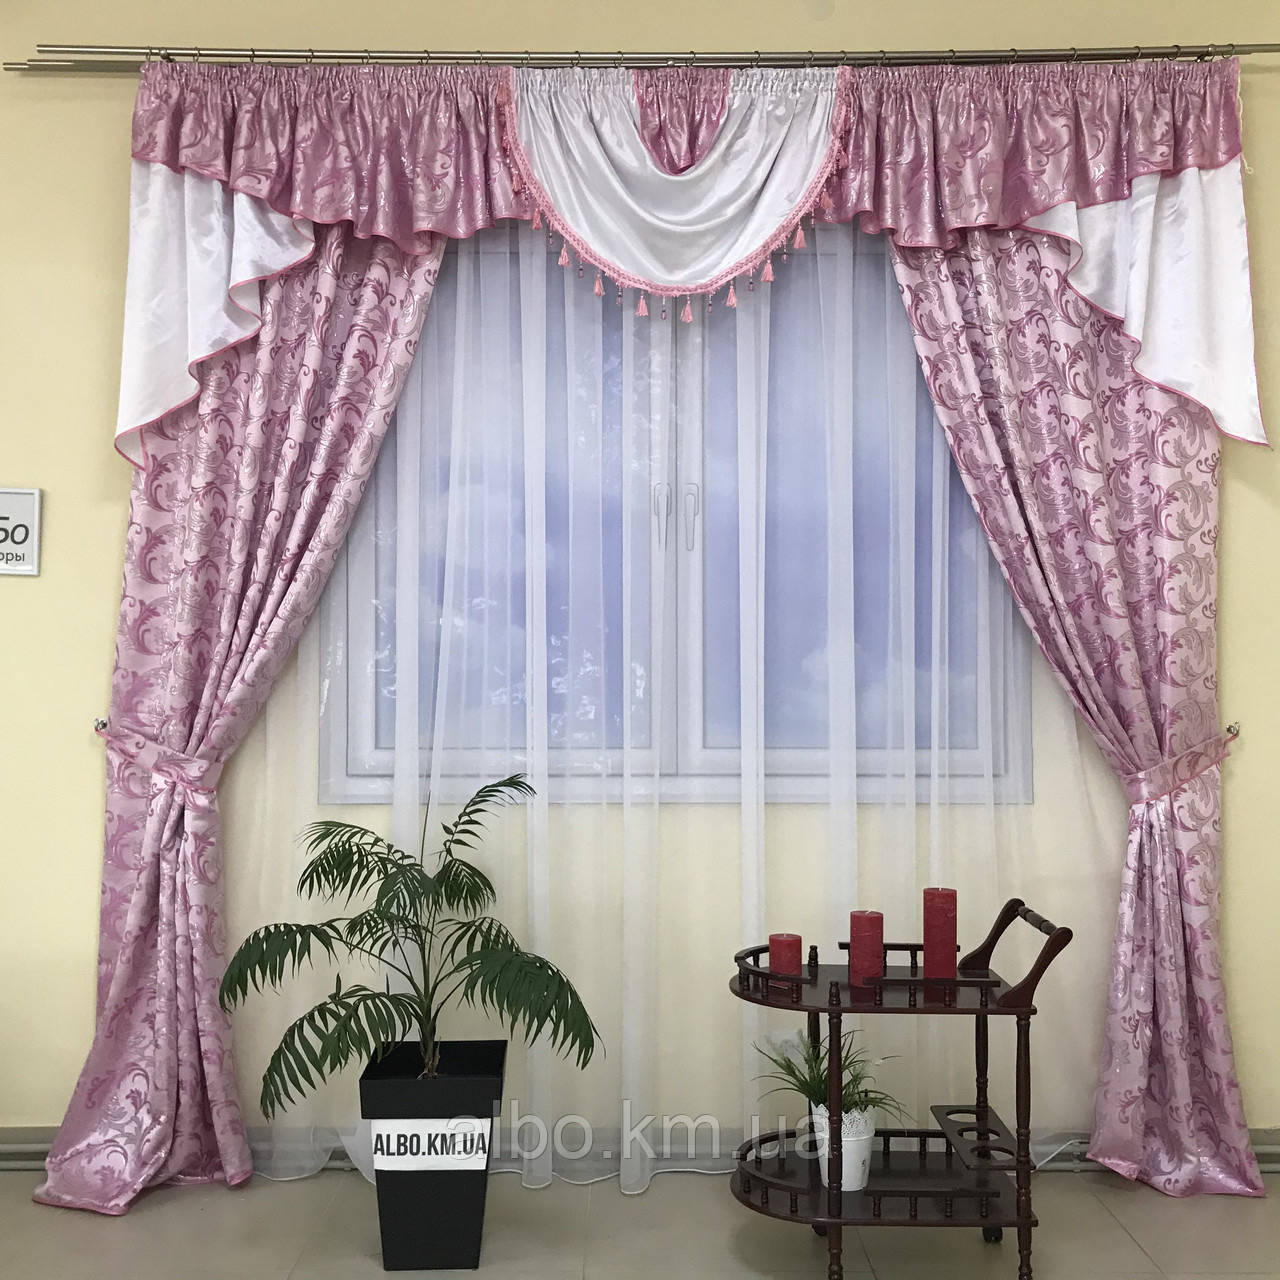 Комплект штор в спальню ALBO 150х270cm (2 шт) и ламбрекен розовый (LS-215-13)